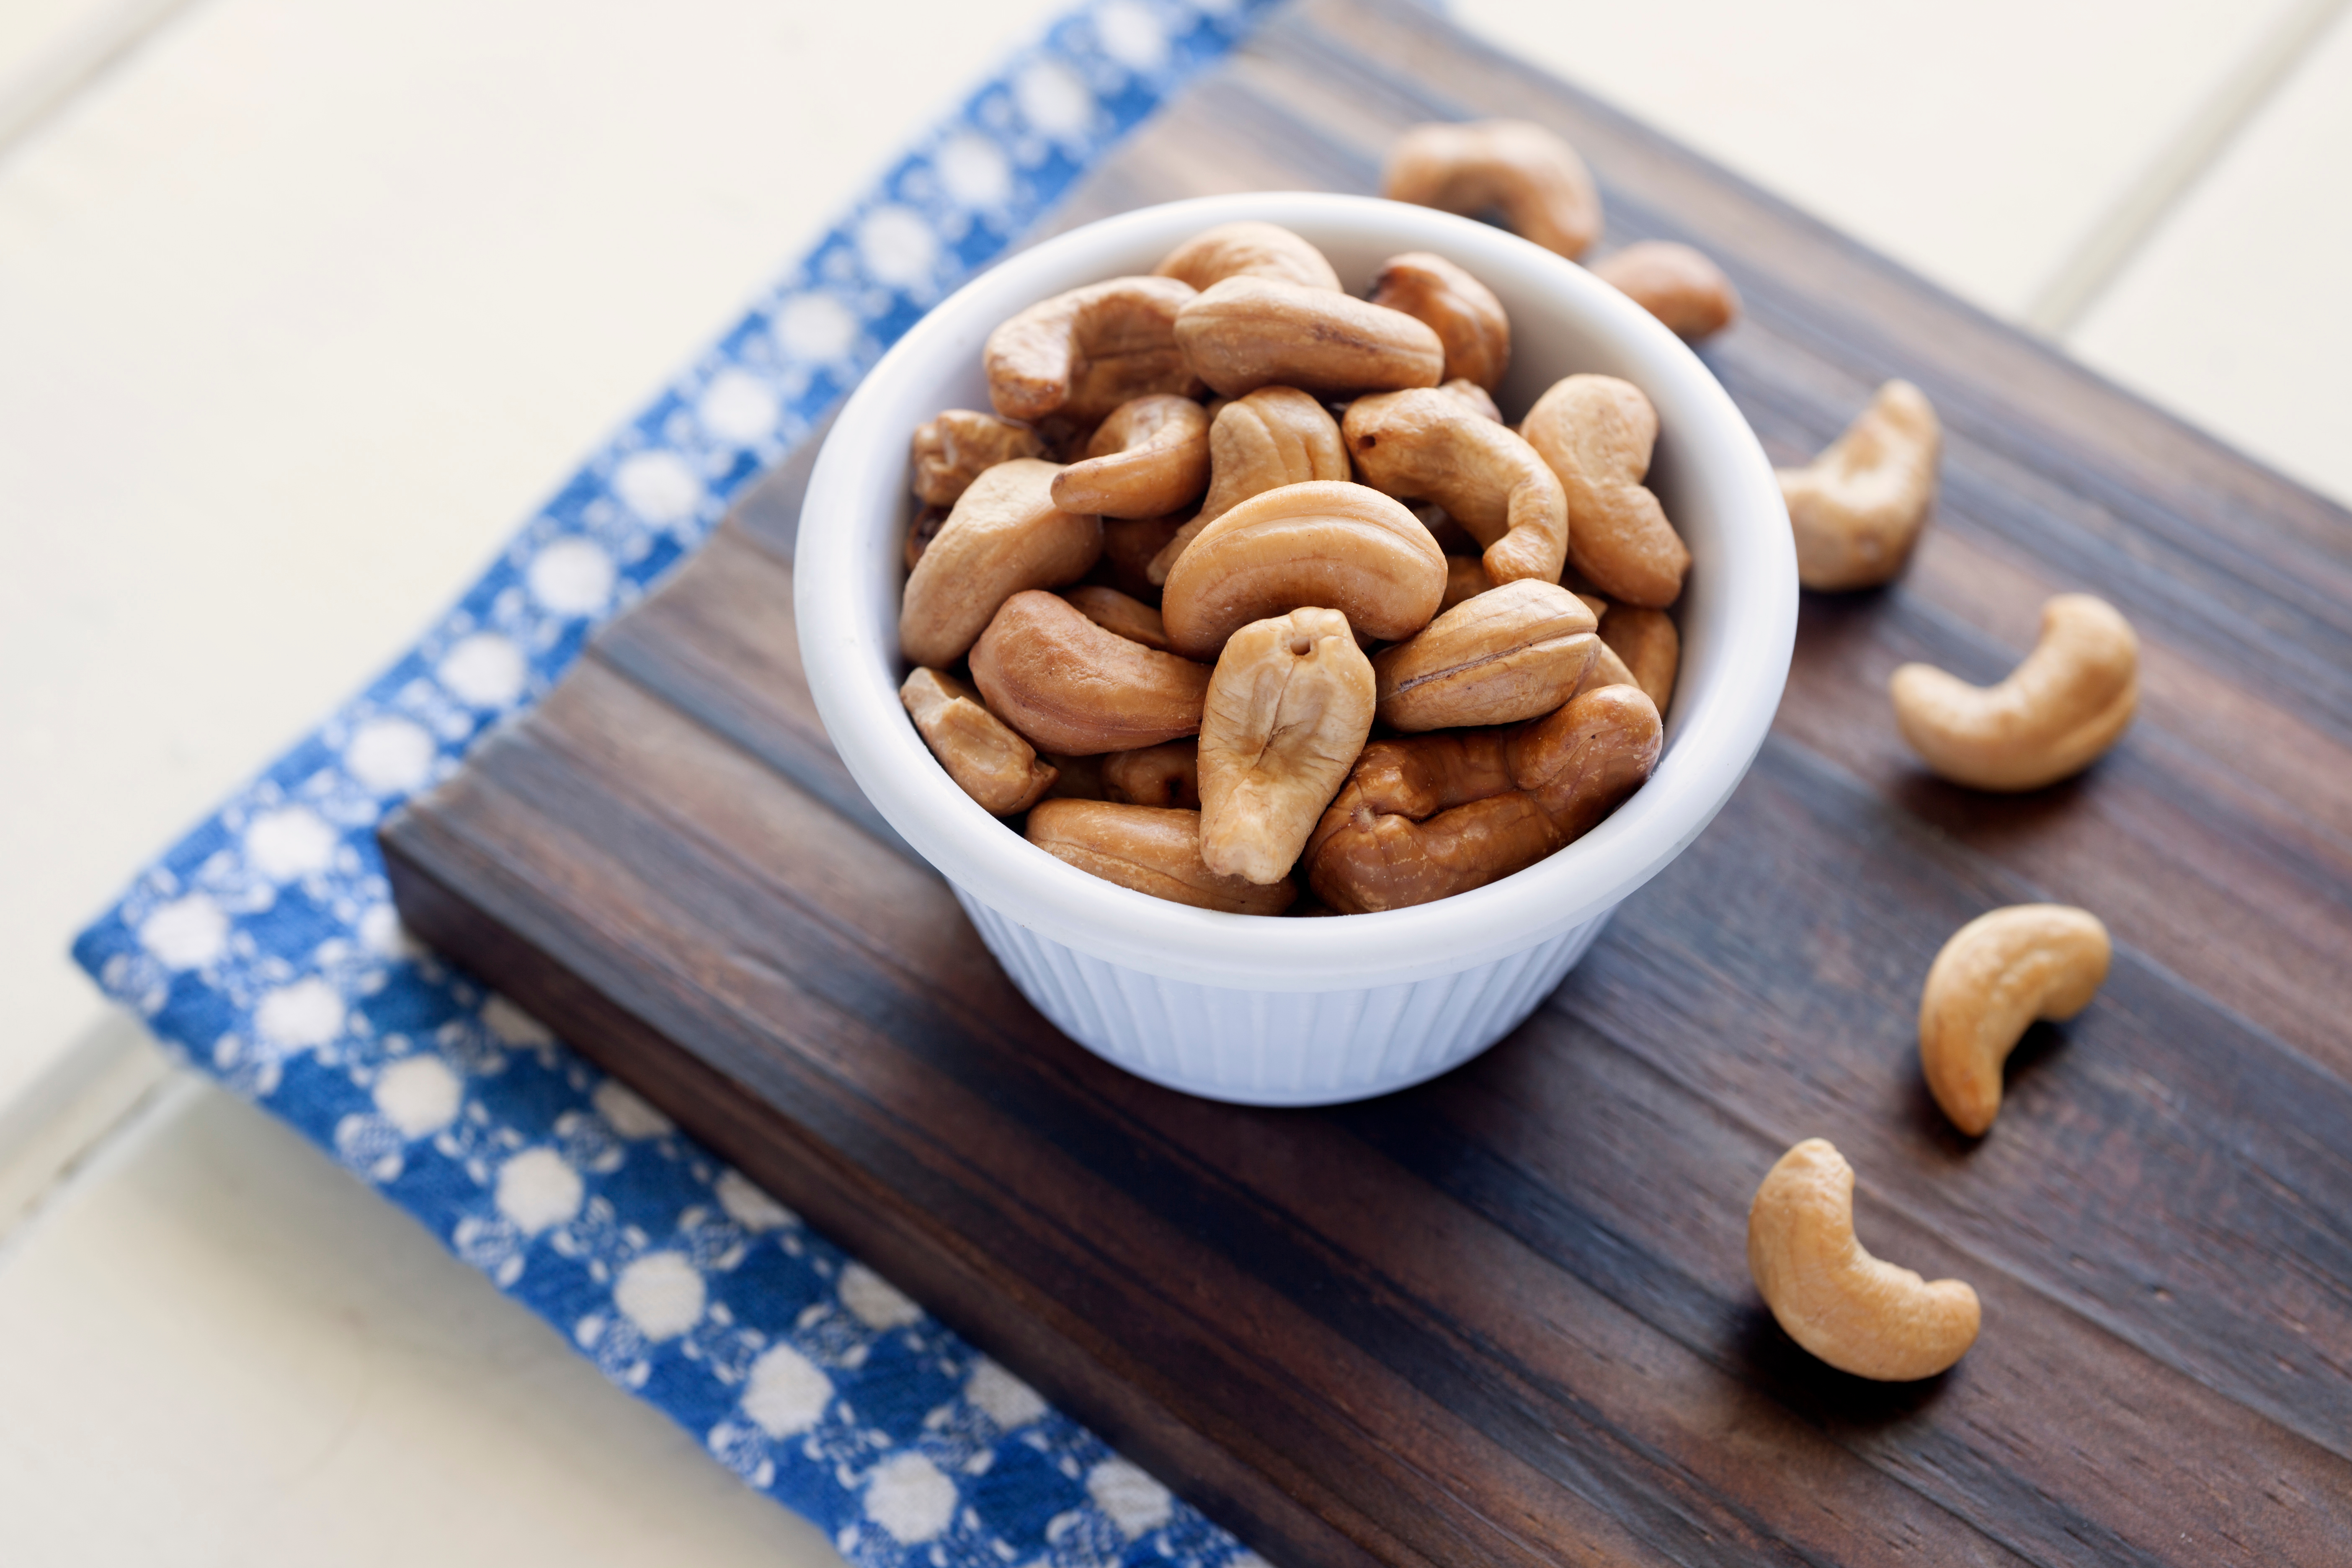 cashews getty